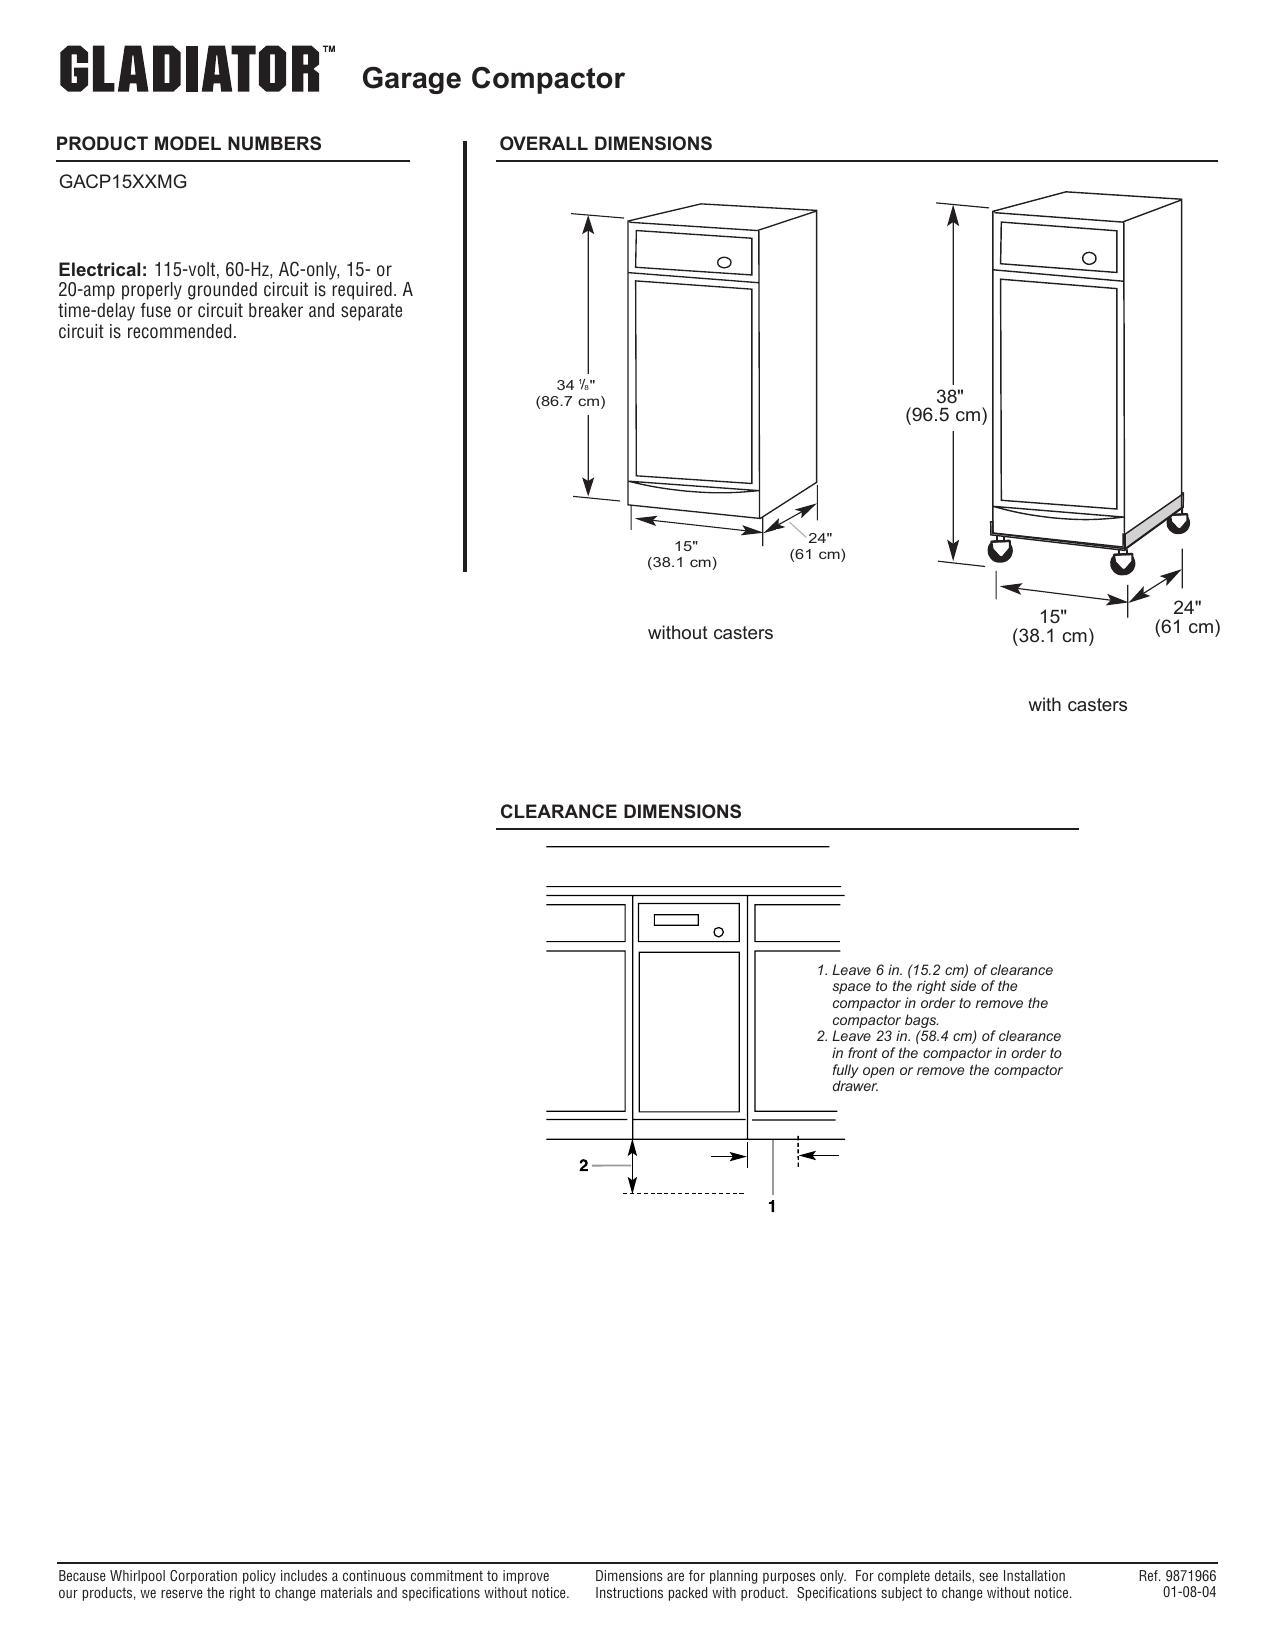 Whirlpool GACP15XXMG GACP15XXMG_Dimension Guide_EN.pdf | Manualzz